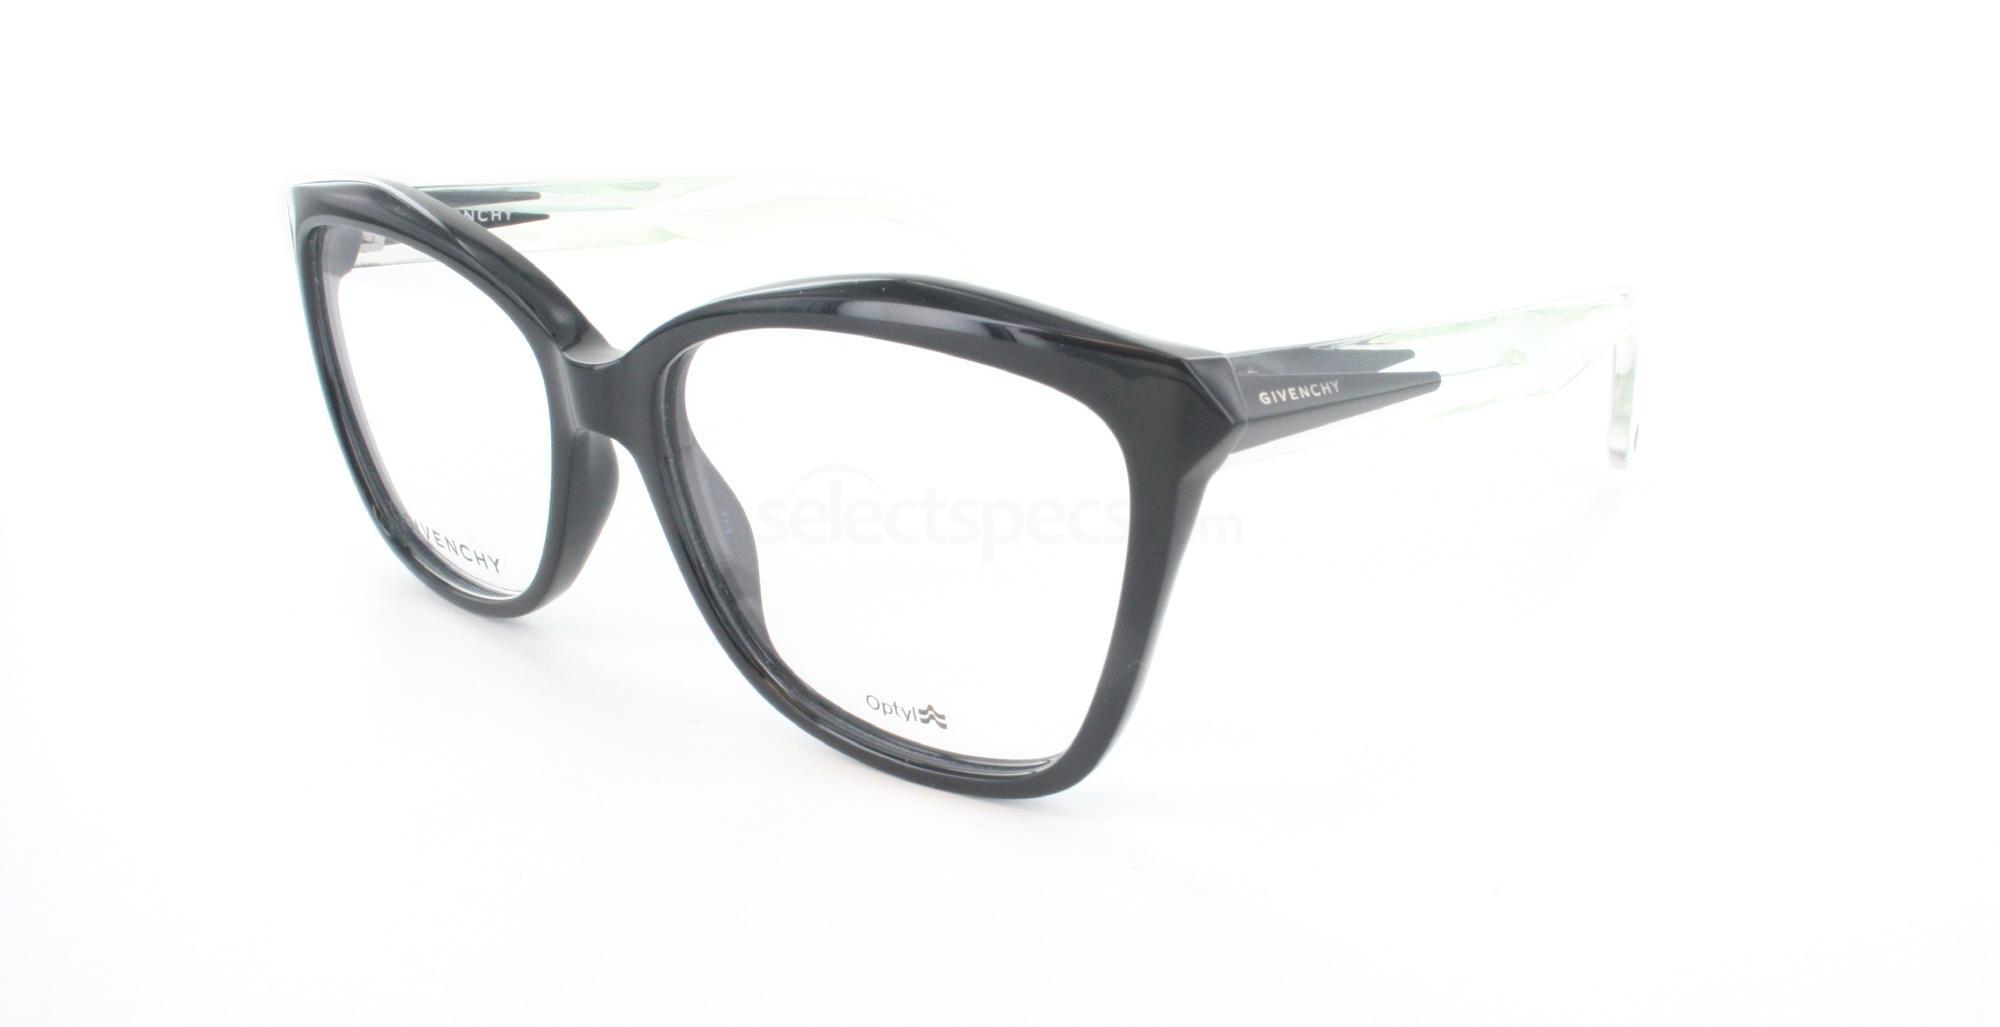 AM3 GV 0008 Glasses, Givenchy